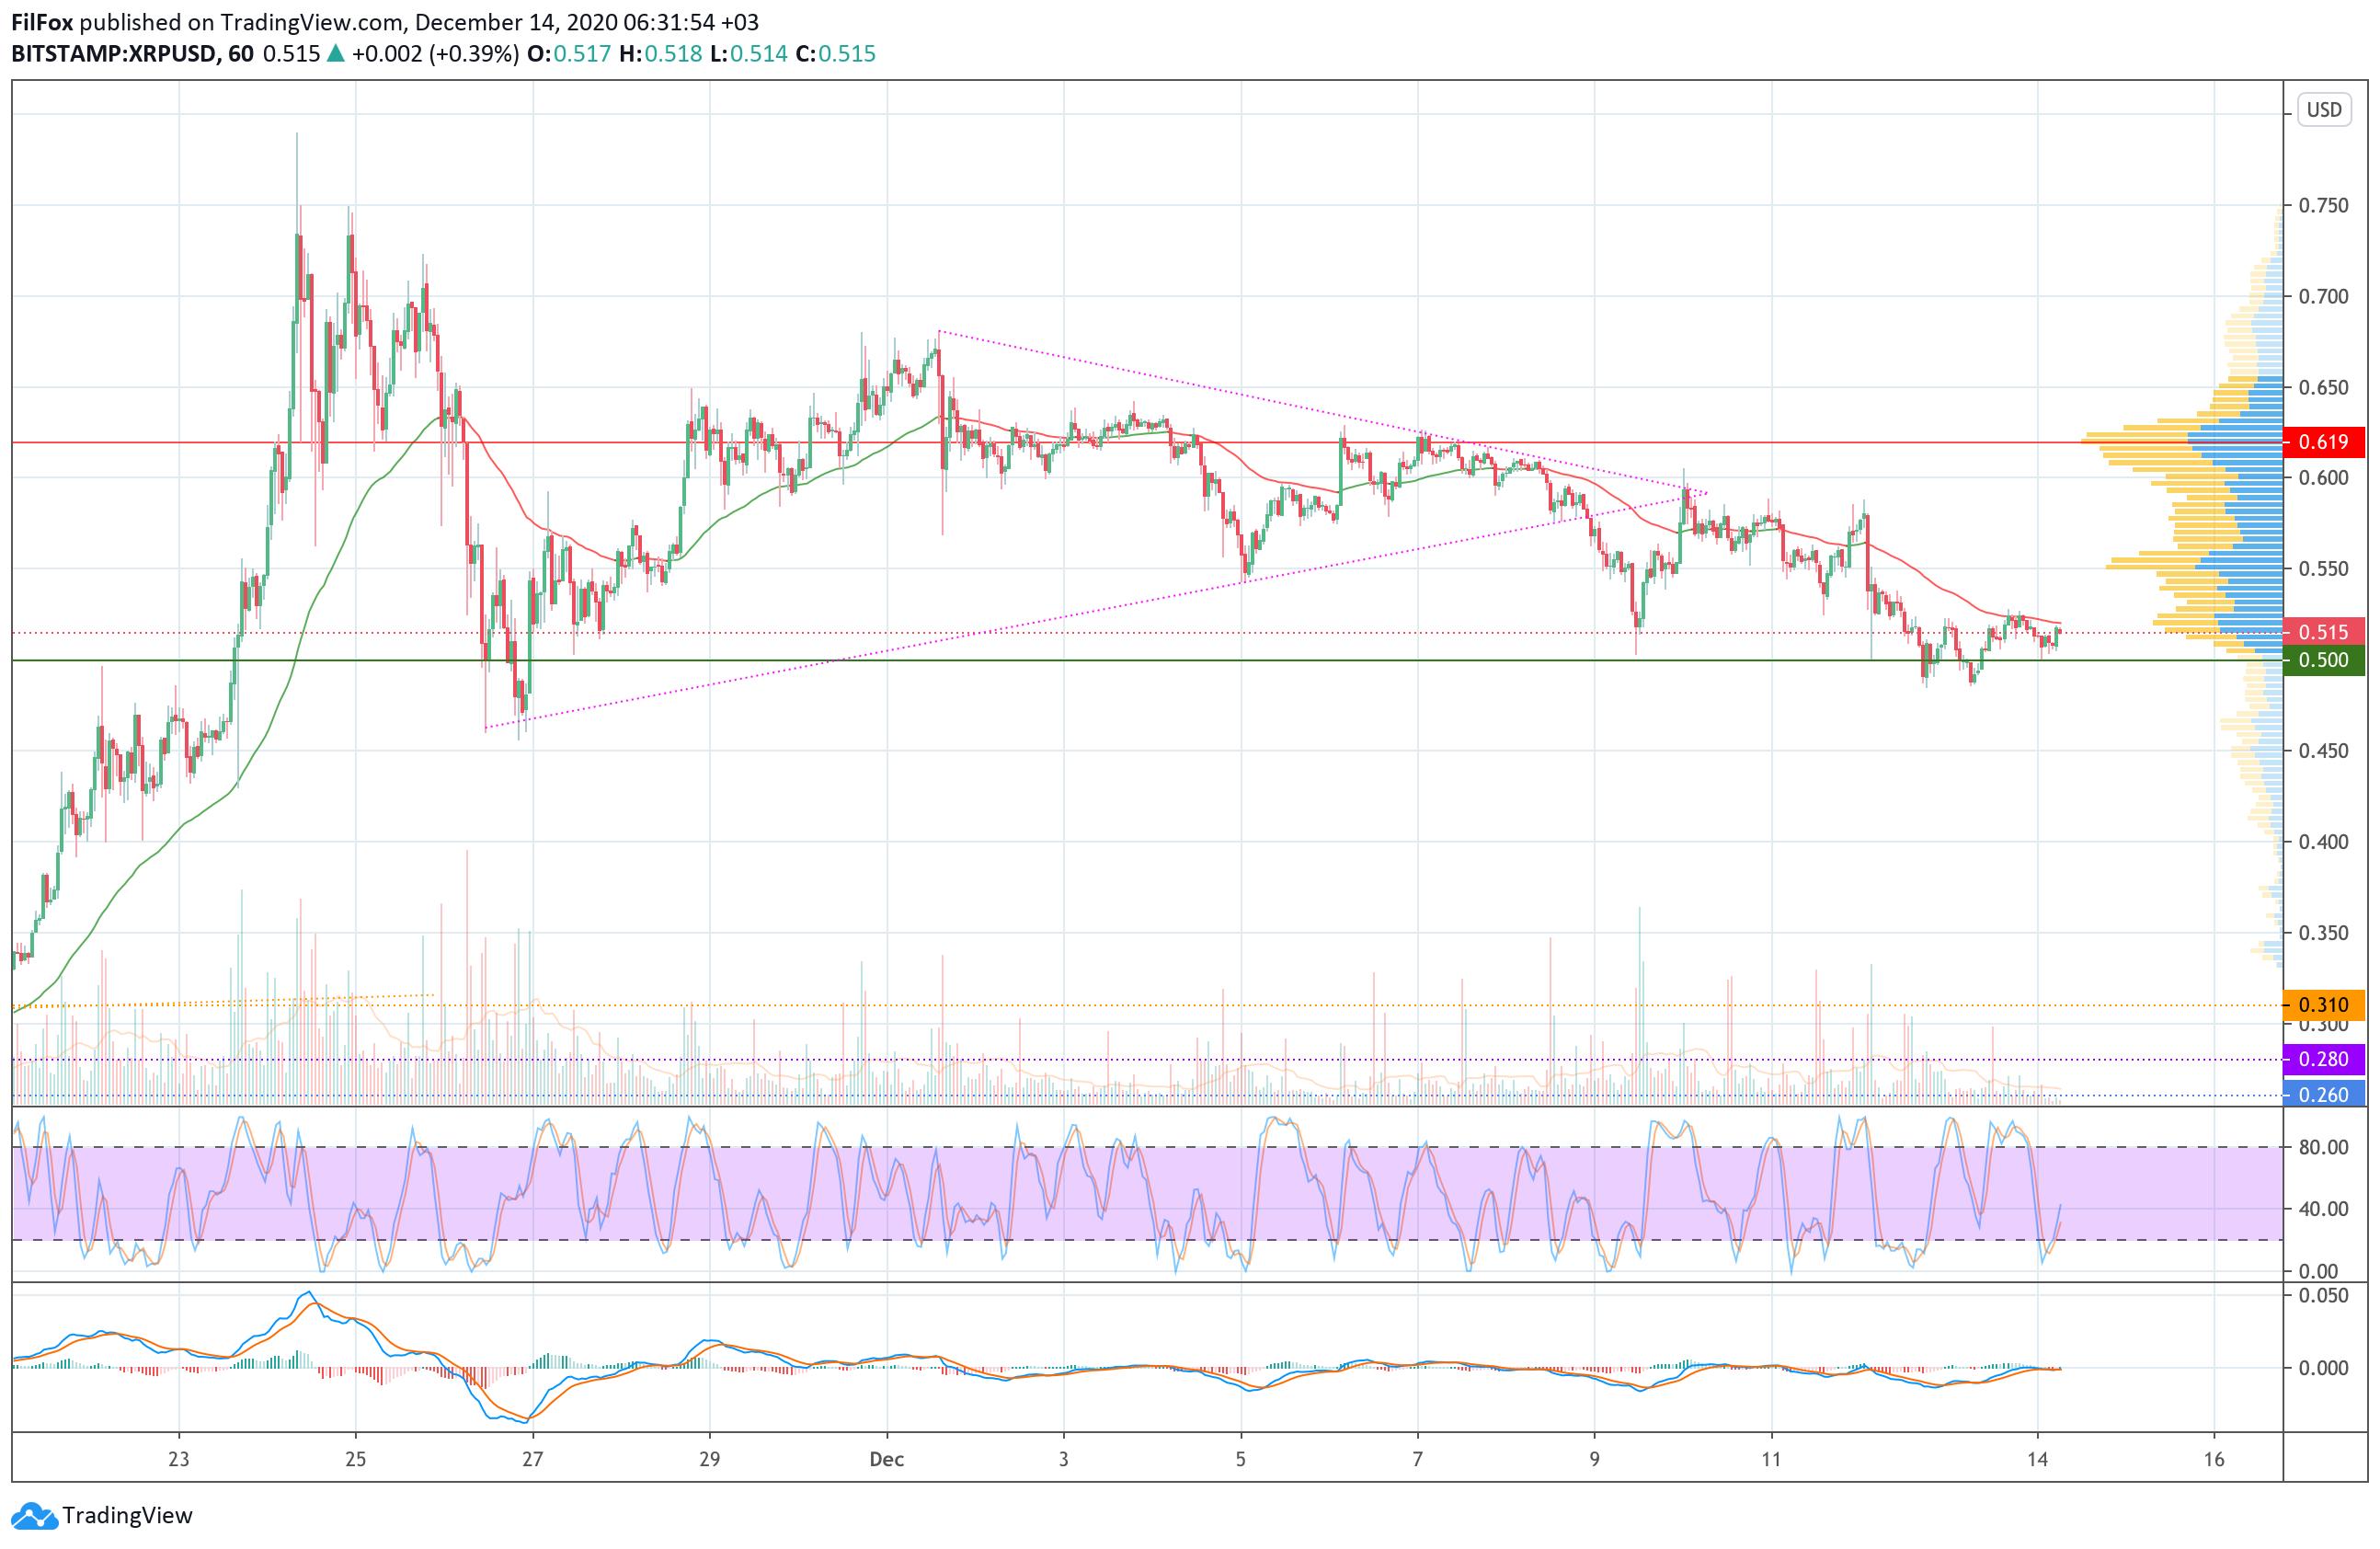 Анализ цен Bitcoin, Ethereum, Ripple на 14.12.2020